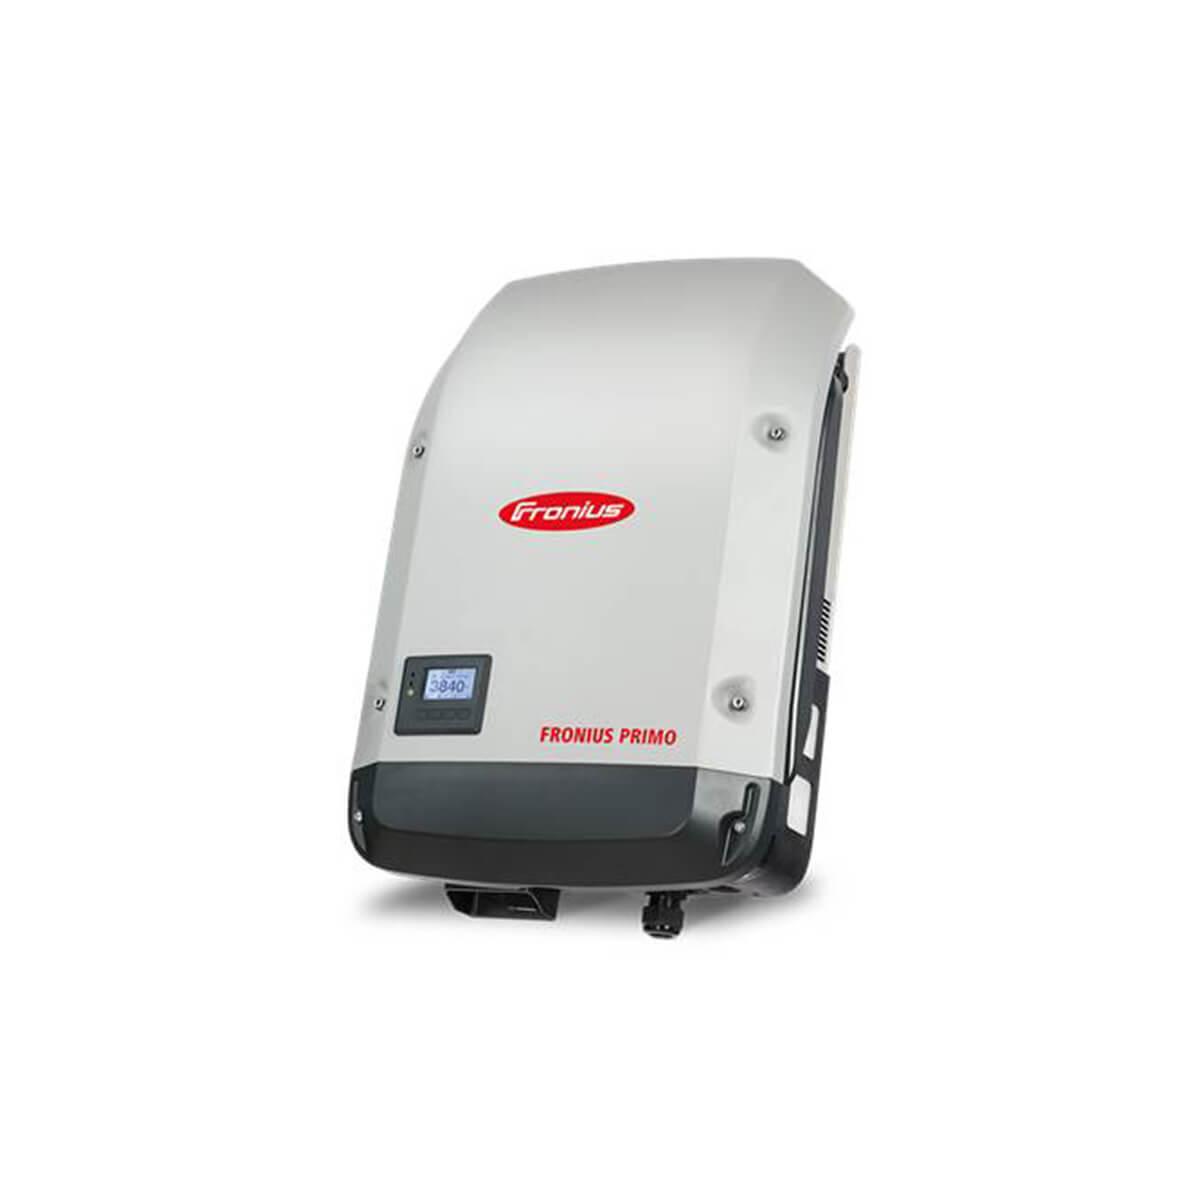 fronius 3.5kW inverter, fronius primo 3.5kW inverter, fronius primo 3.5-1 inverter, fronius primo 3.5-1, fronius primo 3.5 kW